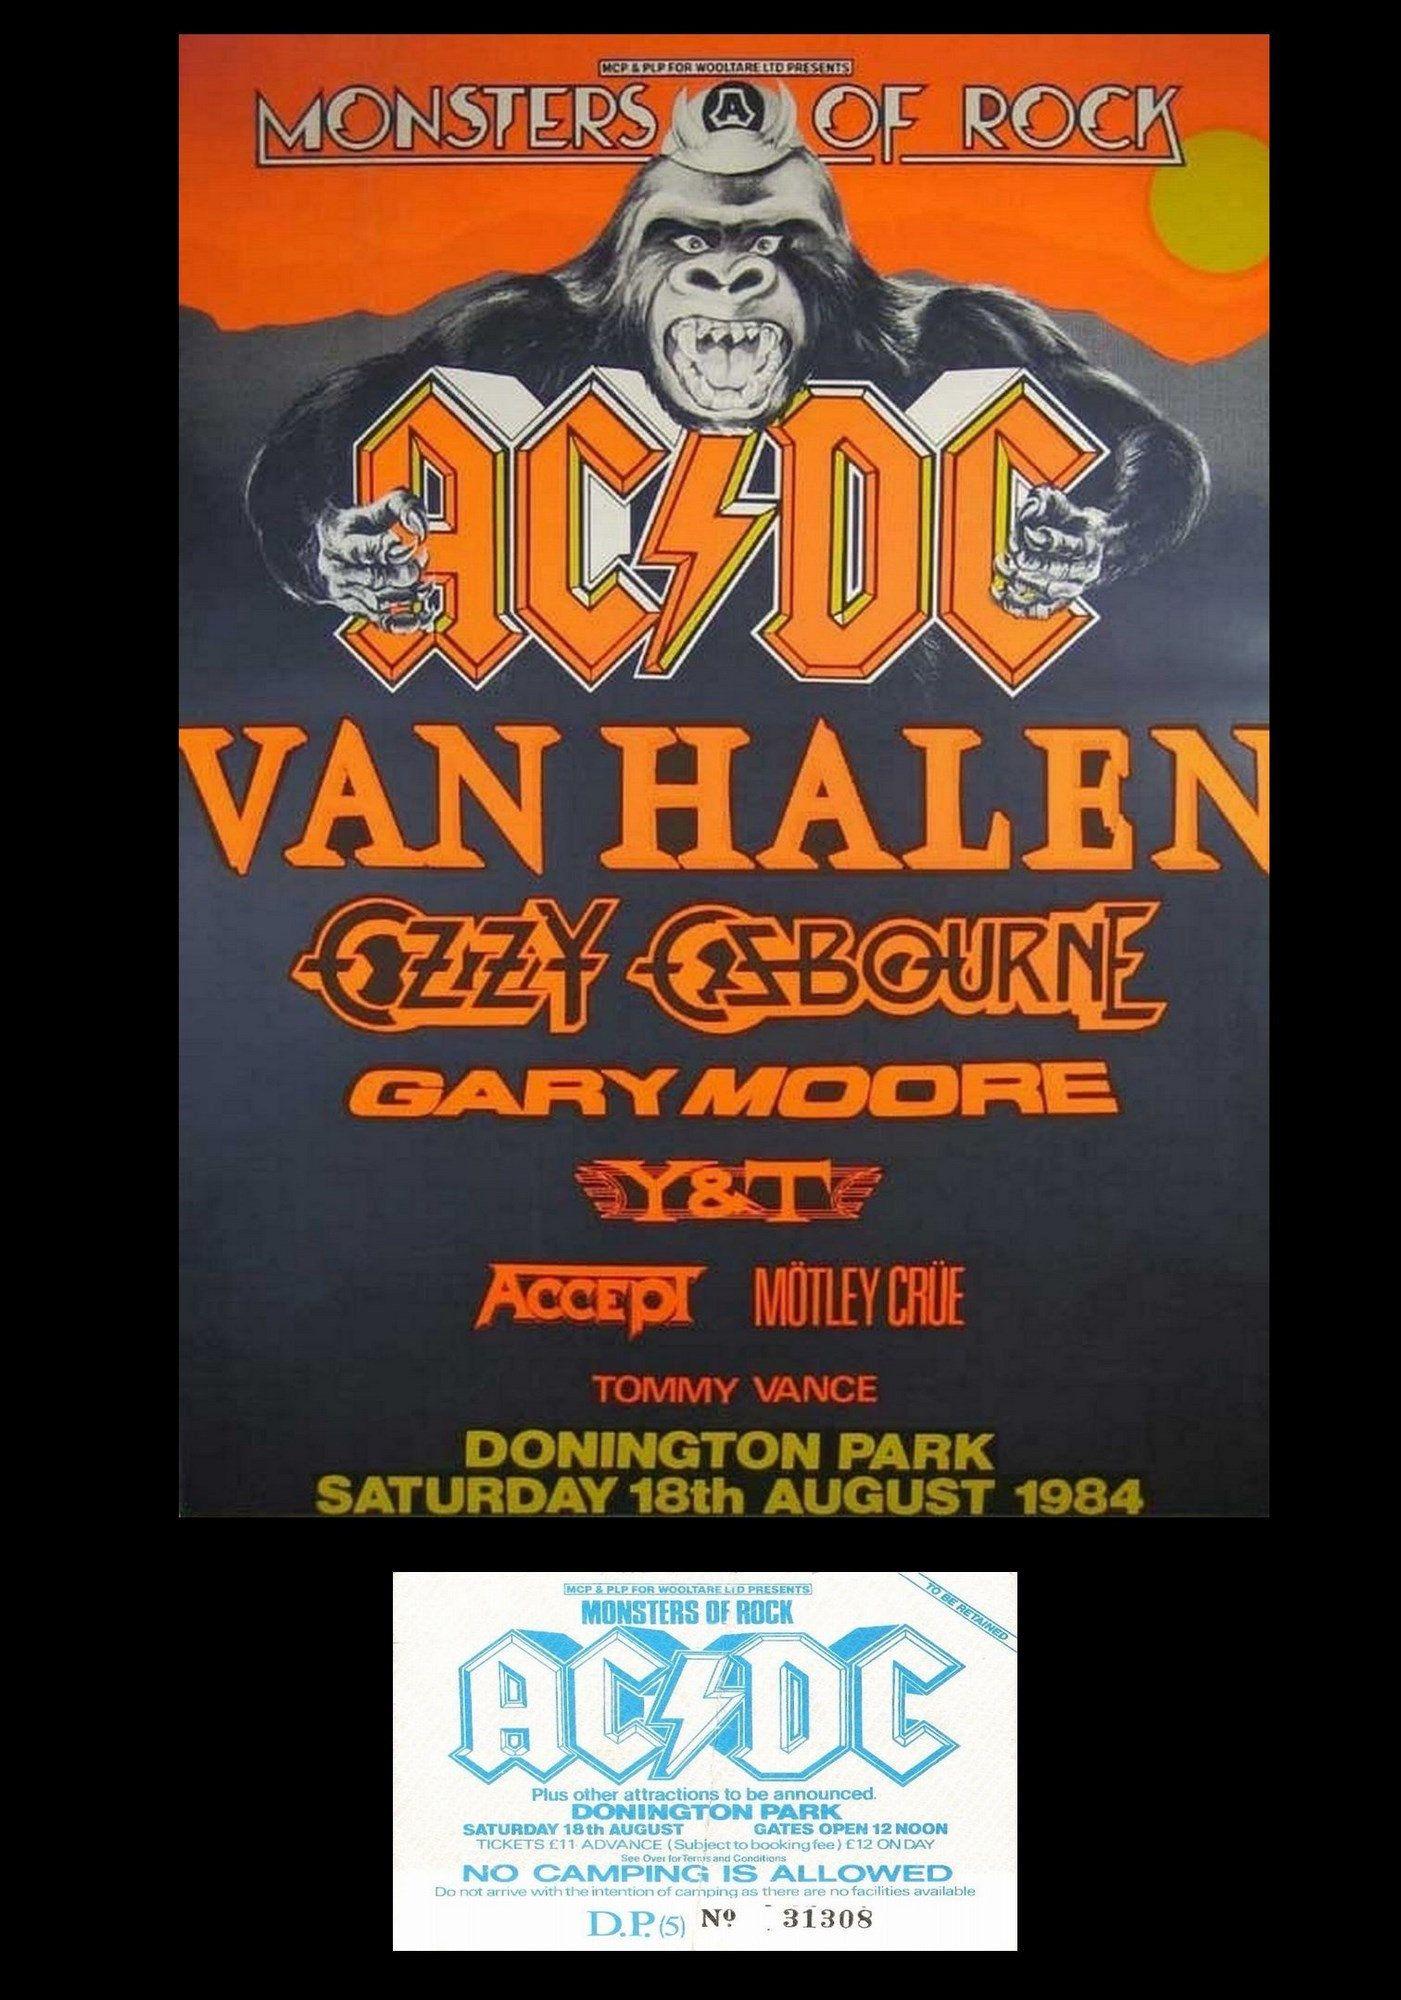 Monsters Of Rock 1984 Vintage Poster Ticket Donington Park Uk 1984 In 2020 Vintage Concert Posters Concert Posters Music Concert Posters